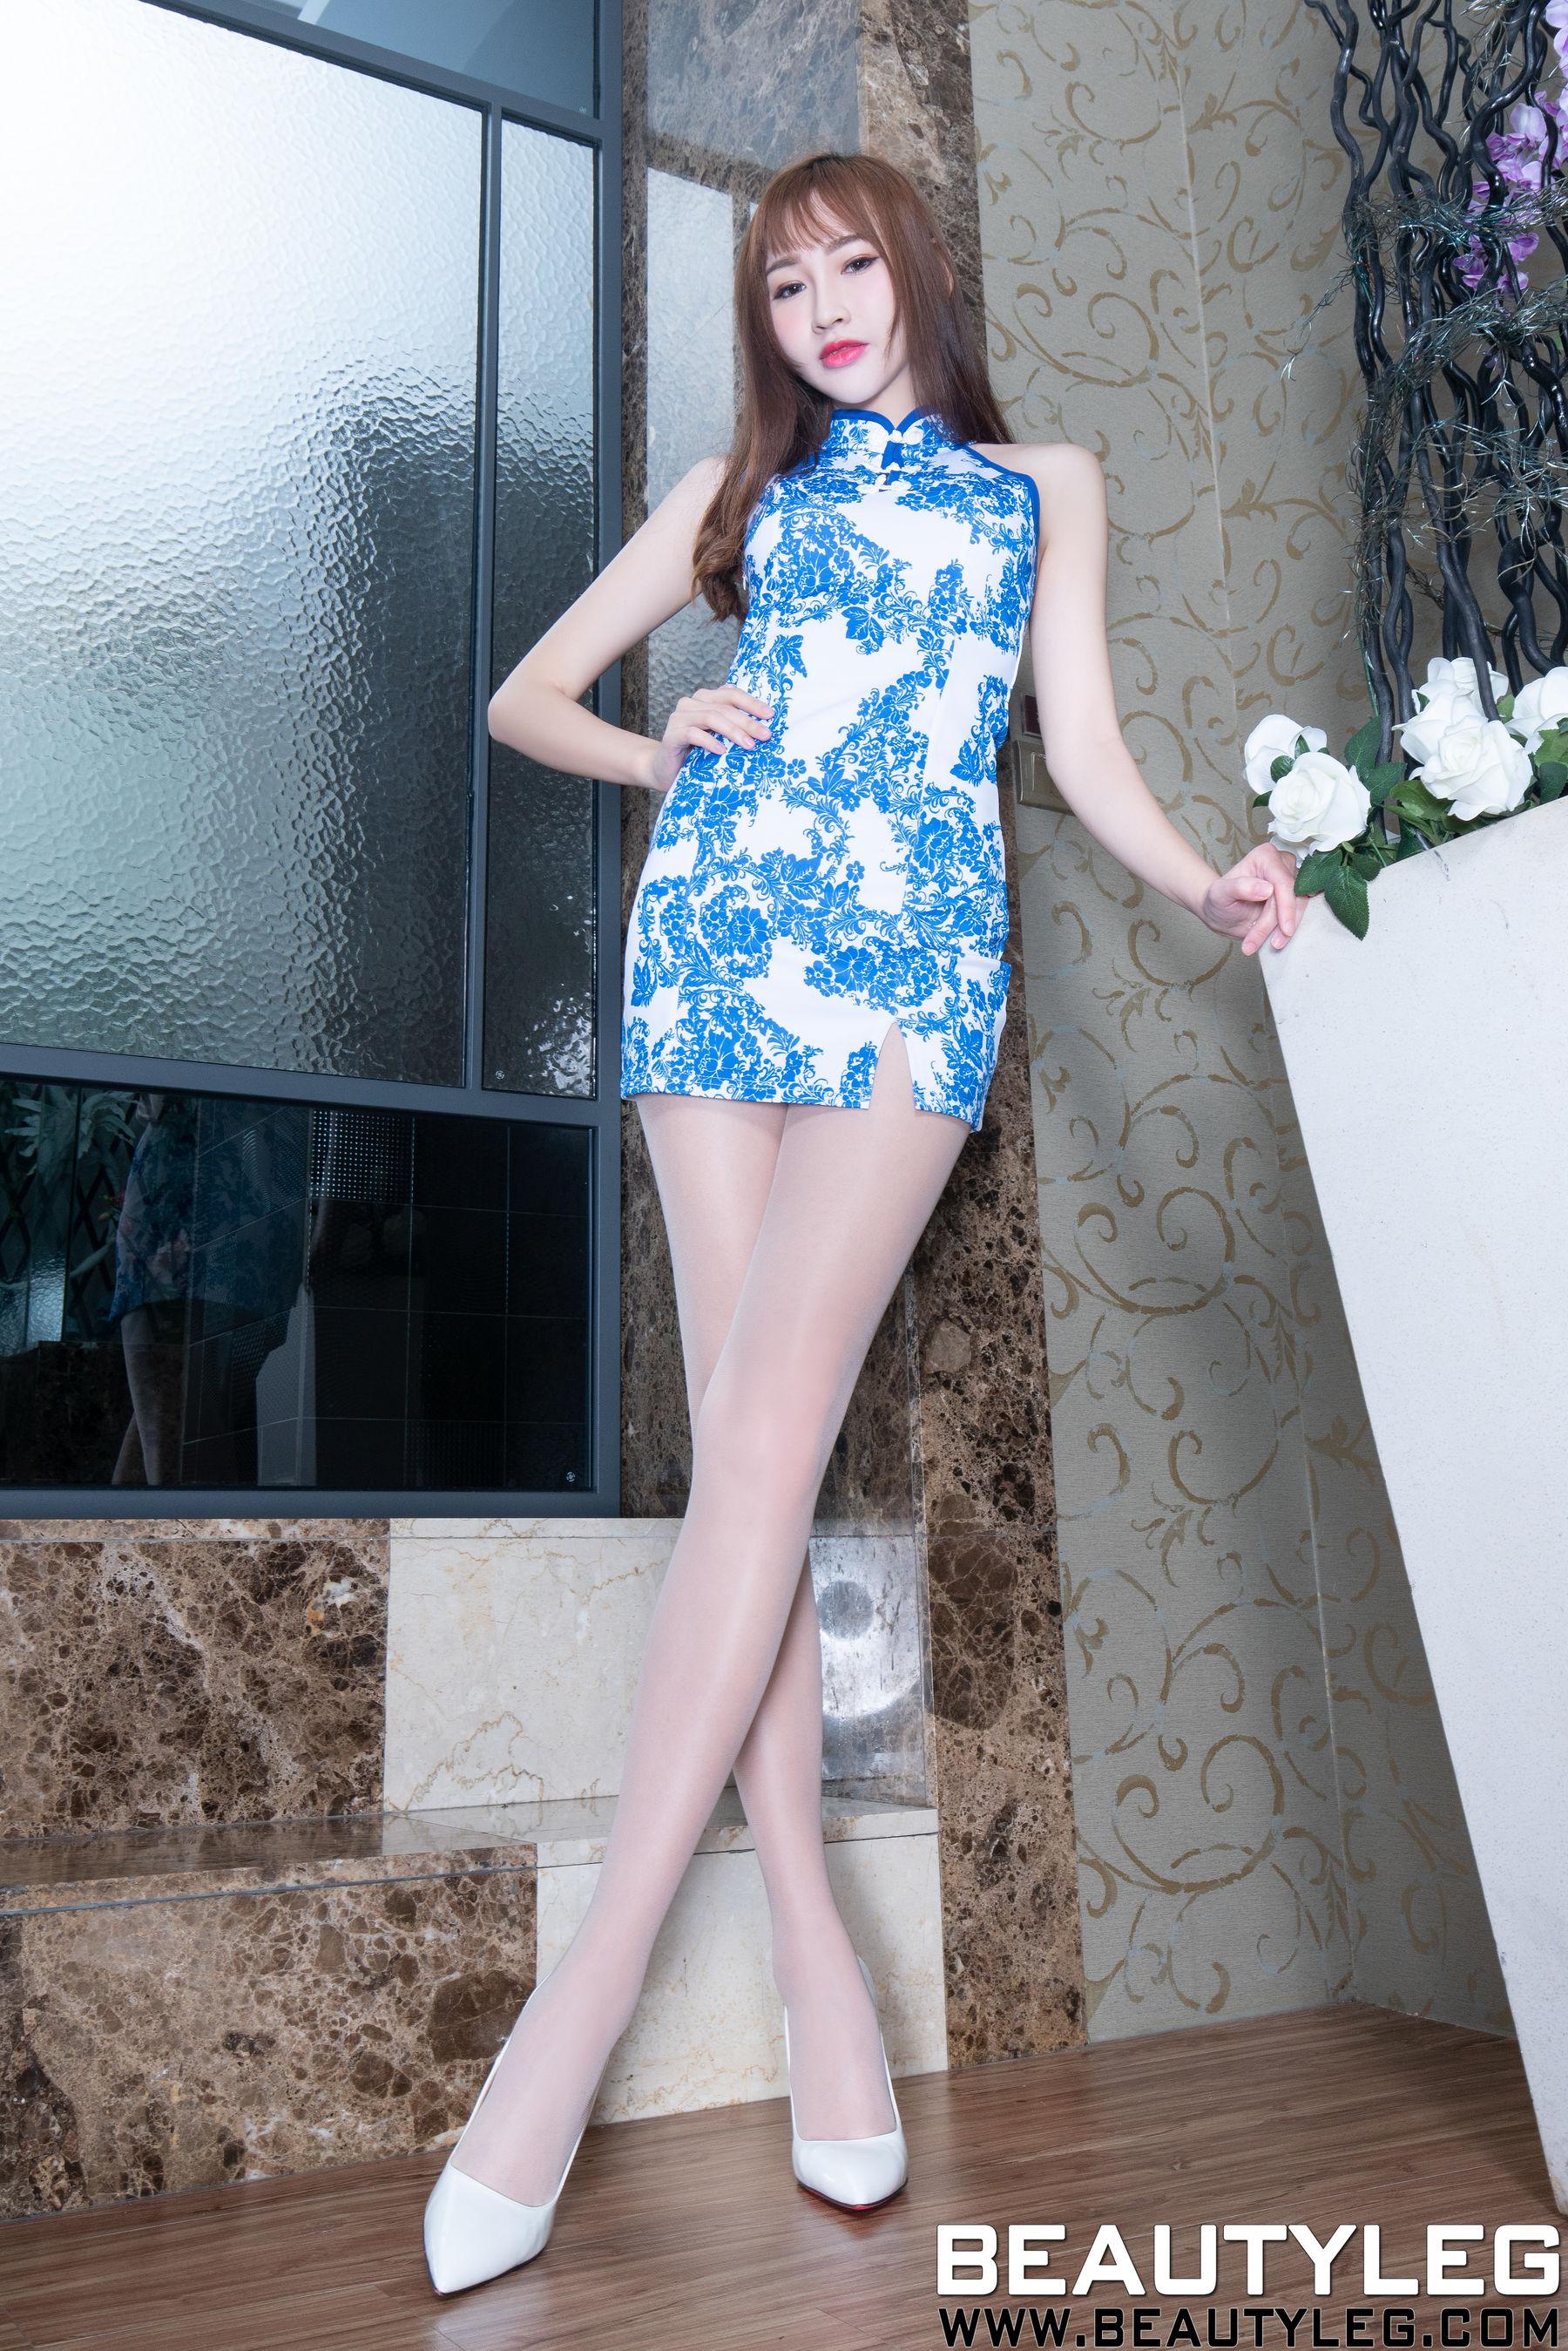 VOL.453 [Beautyleg]美腿高跟:腿模ChiChi超高清个人性感漂亮大图(50P)